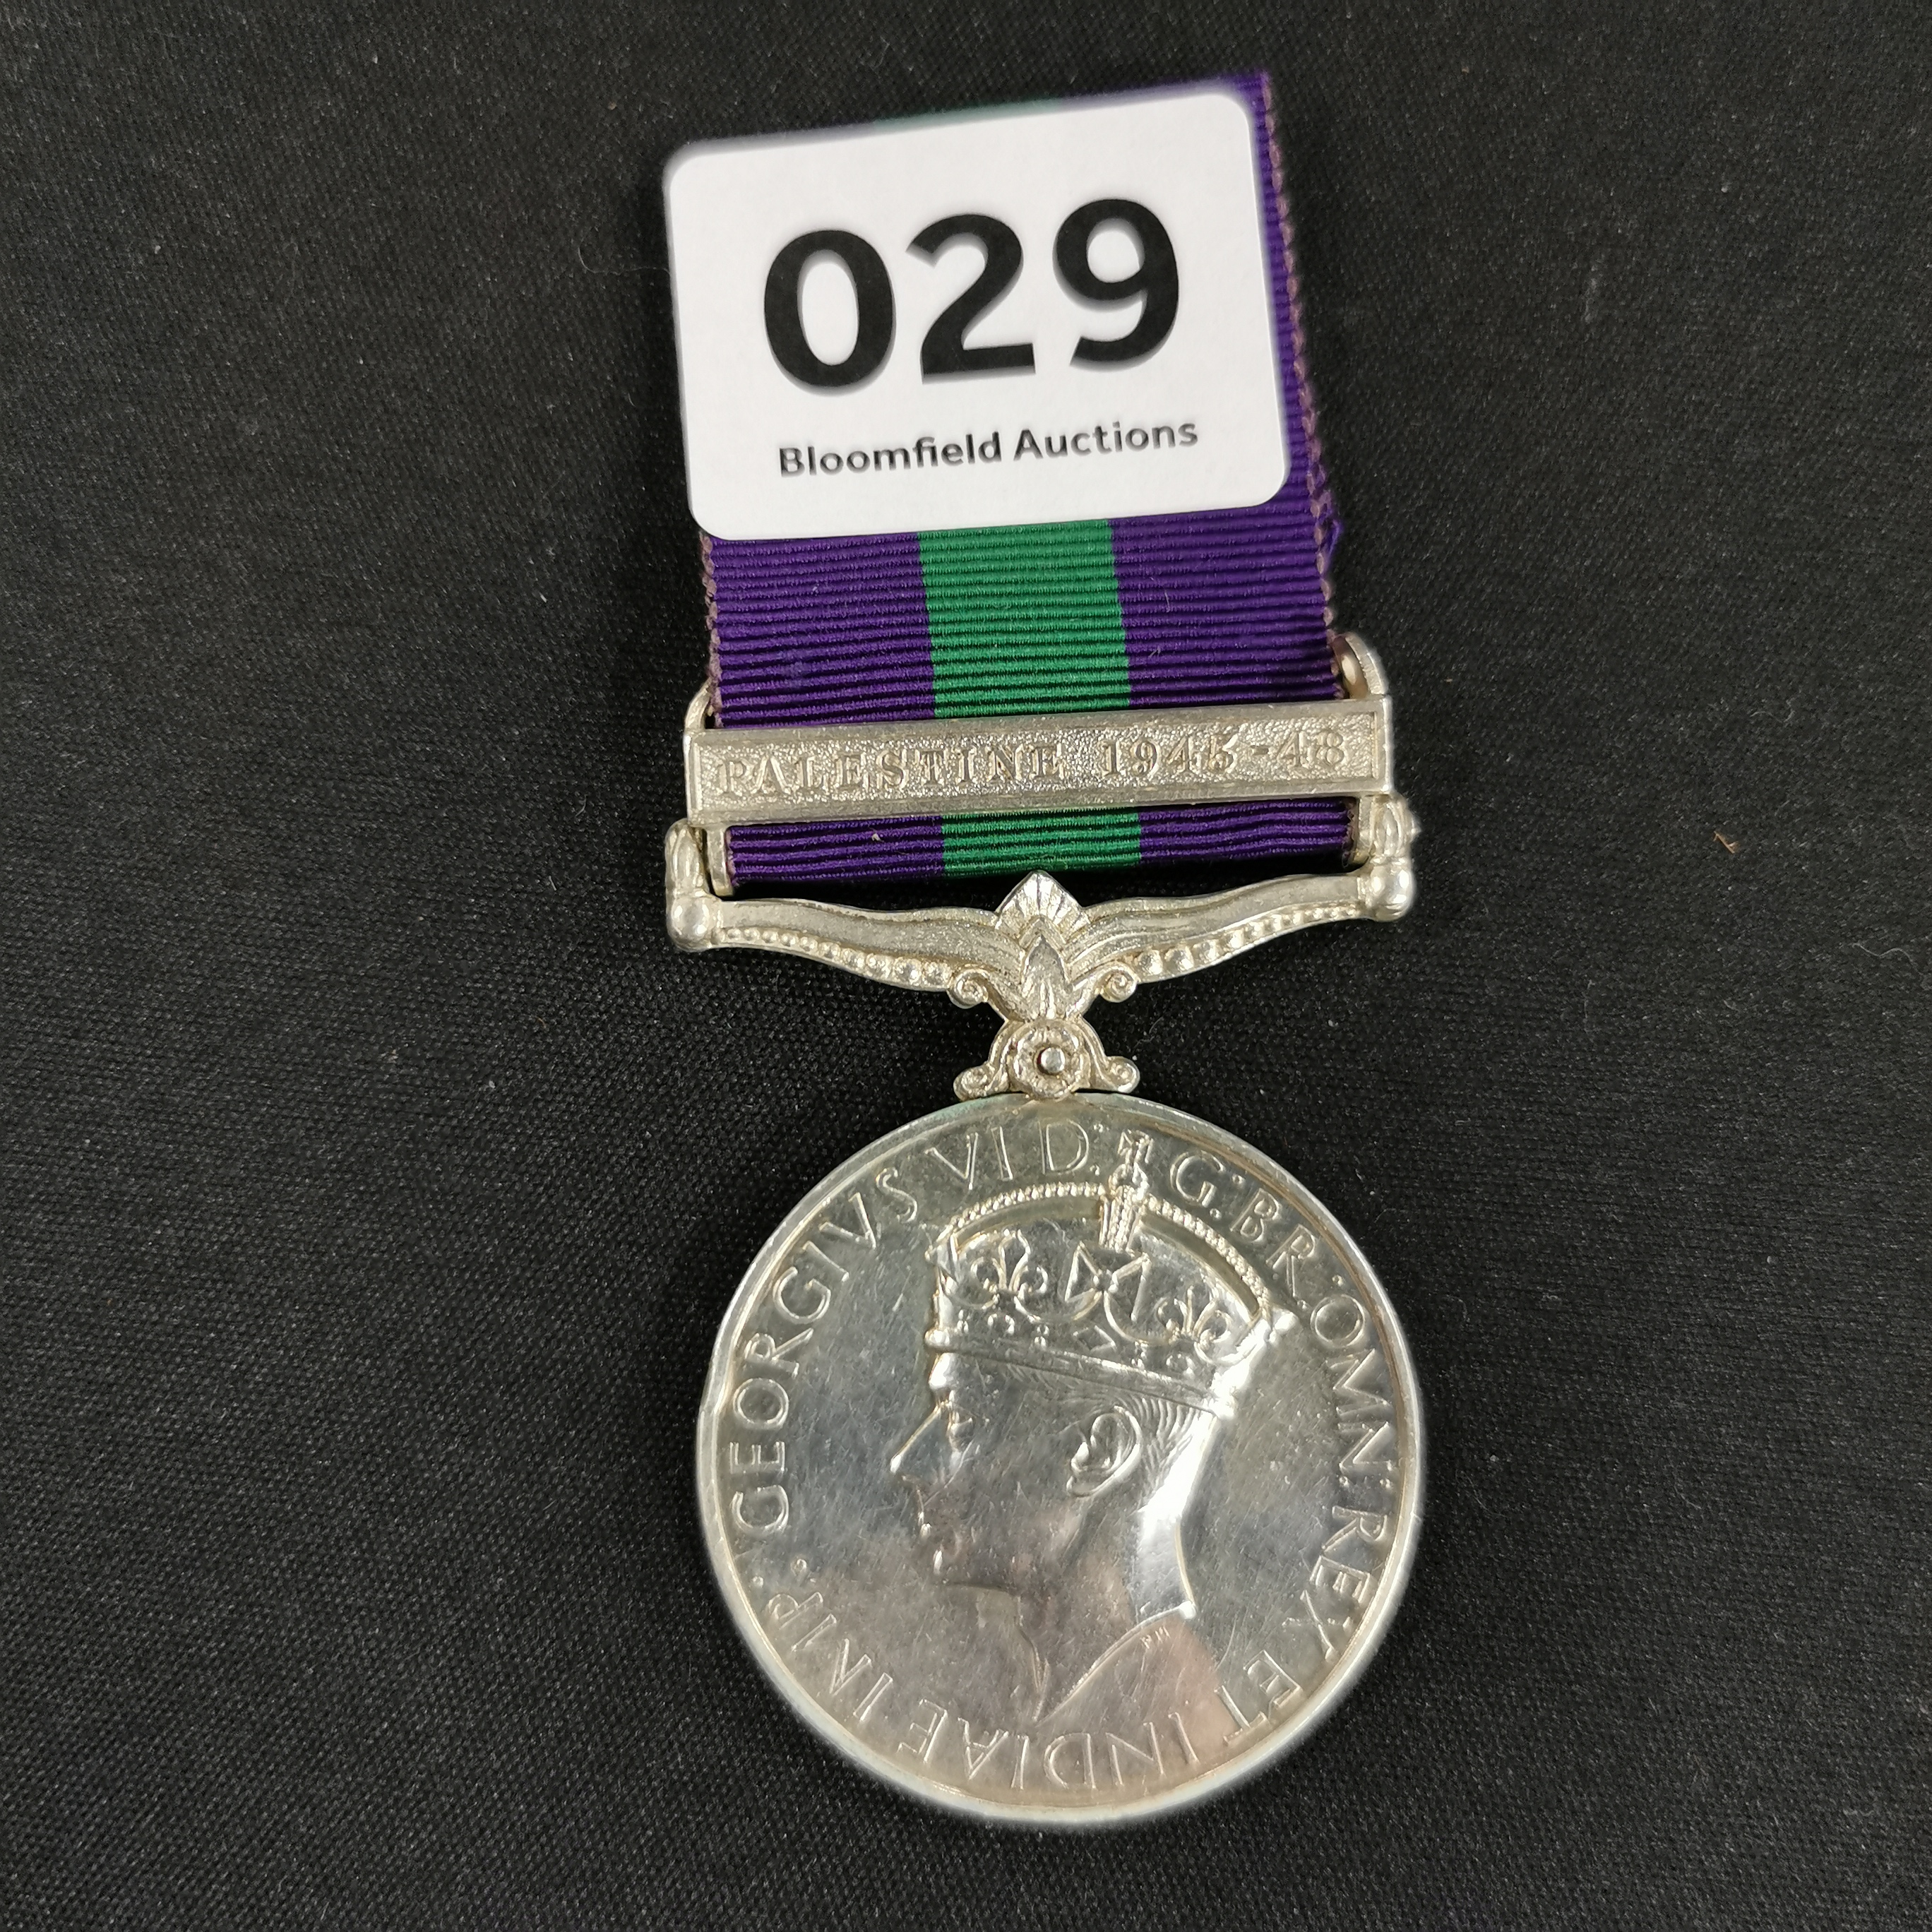 Lot 29 - G.S.M. PALESTINE 1945-1948 ROYAL IRISH FUSILIERS - 19114405 FUS. L EASBY R.I.R.F